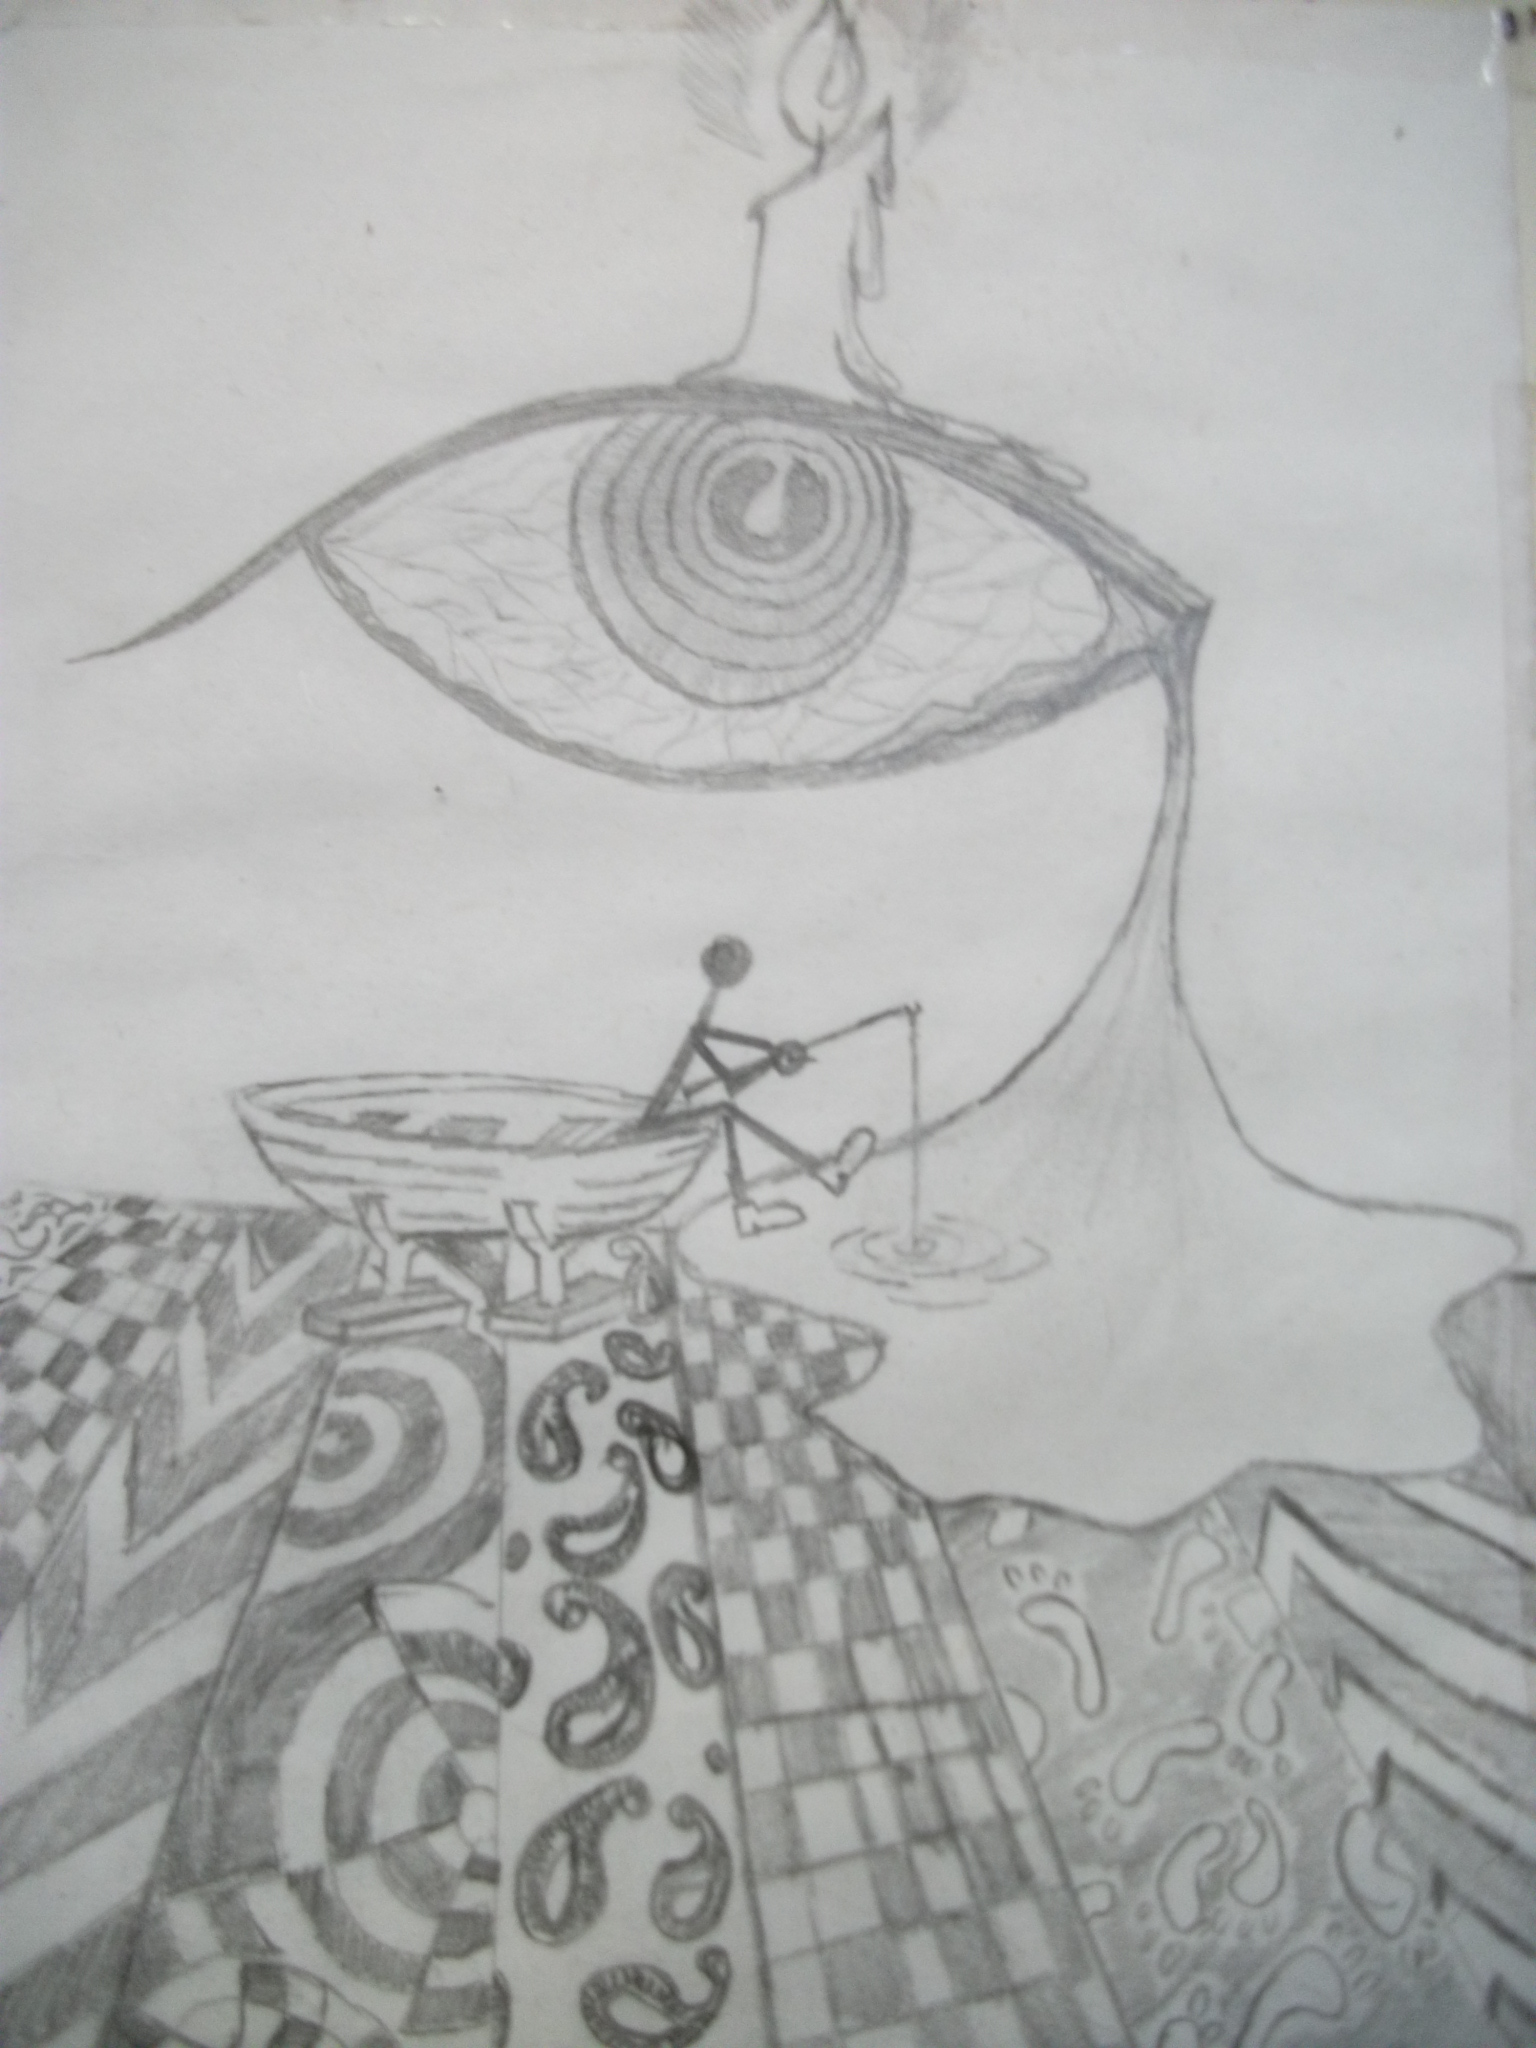 ڈُوڈل آرٹ Doodle-Art